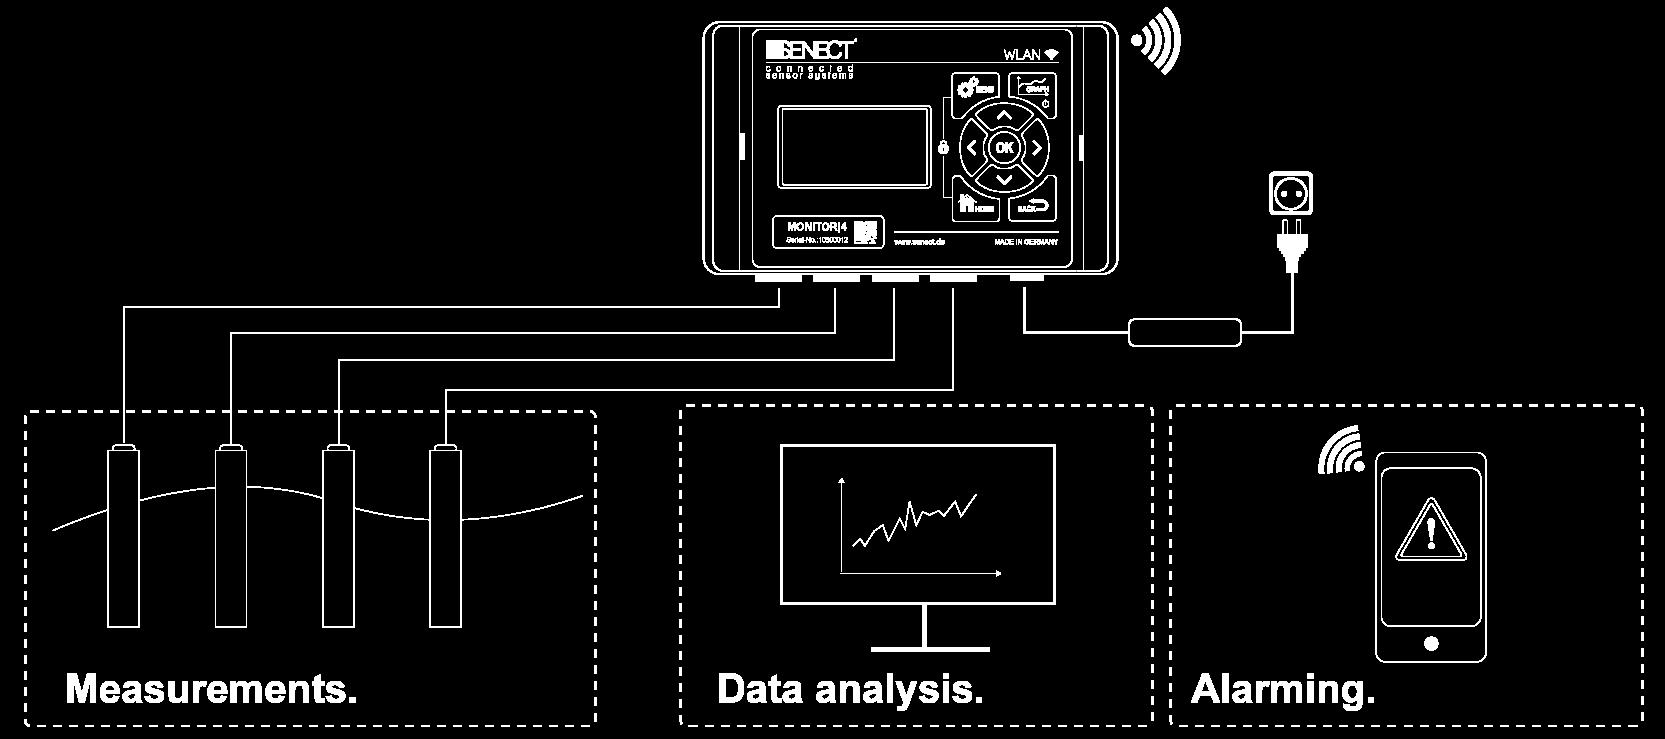 MONITOR|4 Application